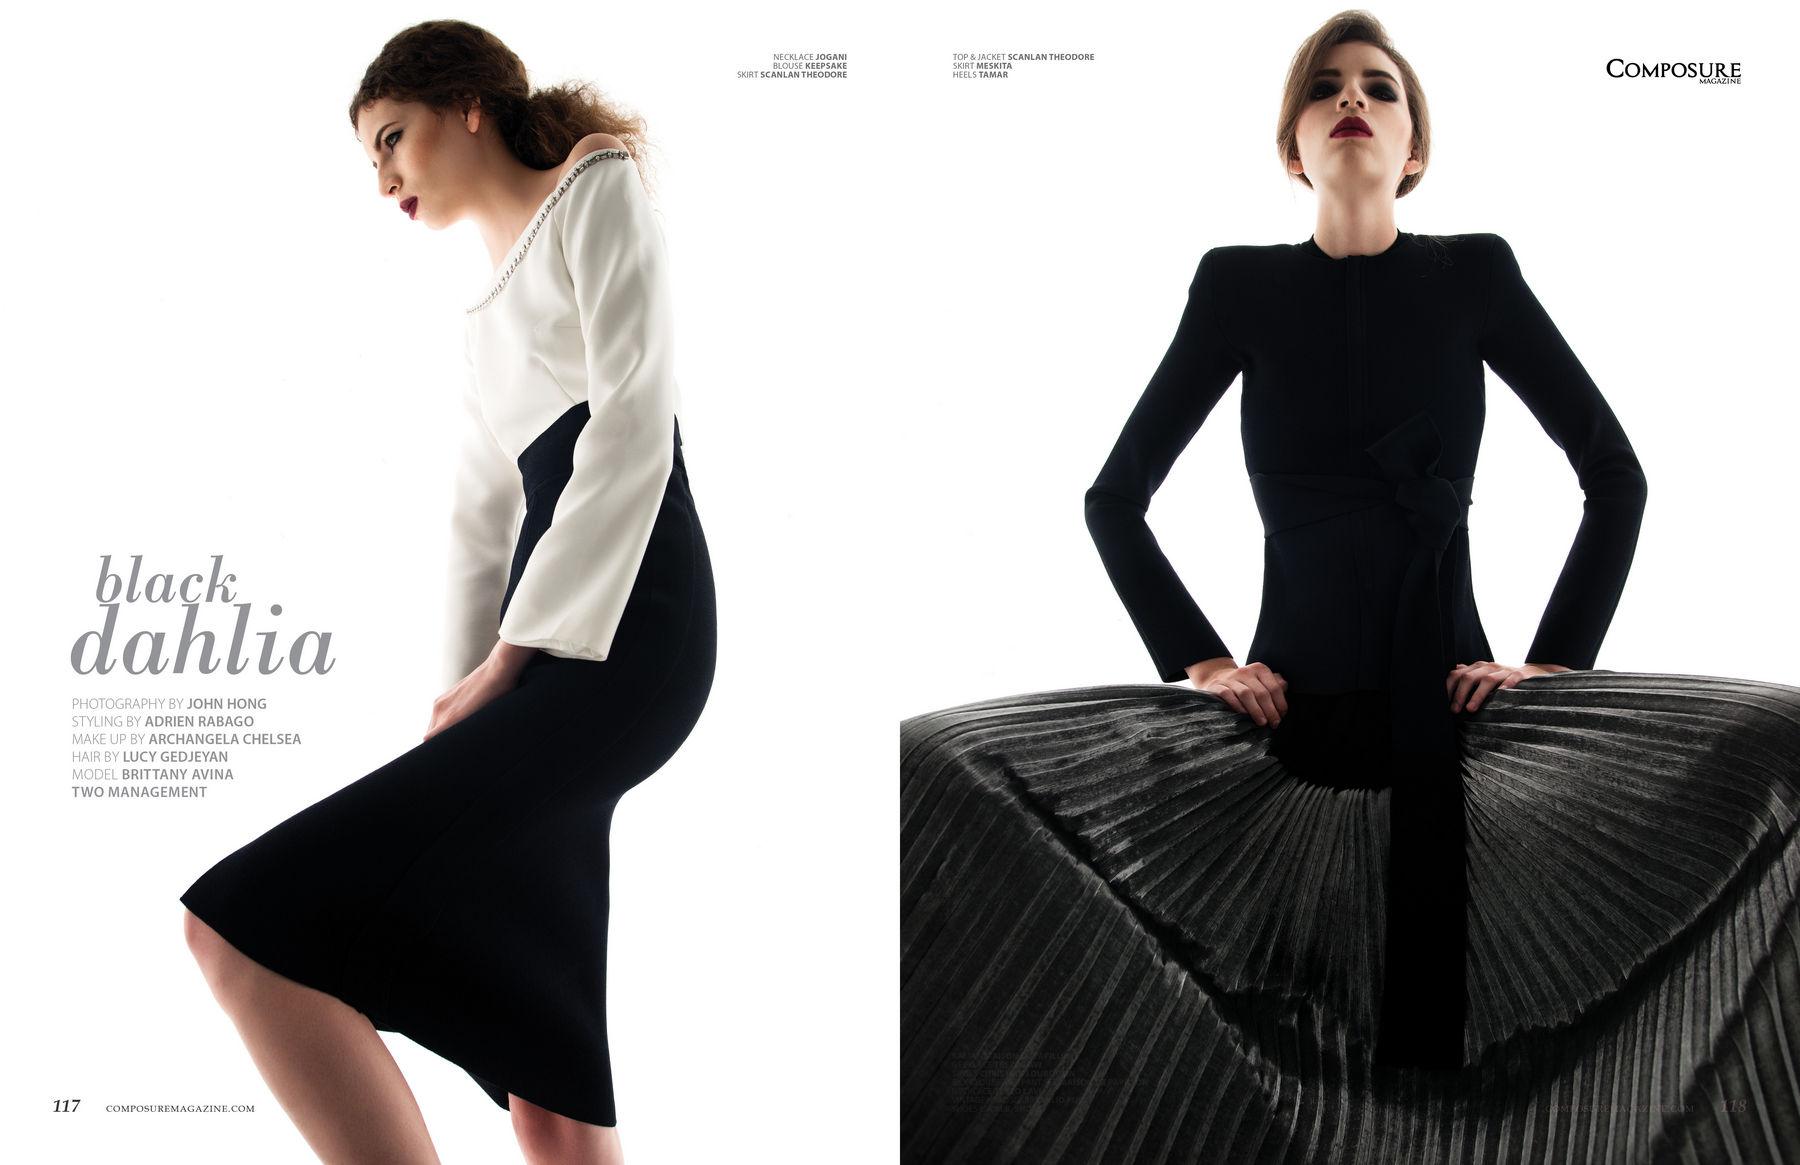 Fashion editorial quot black dahlia quot by john hong